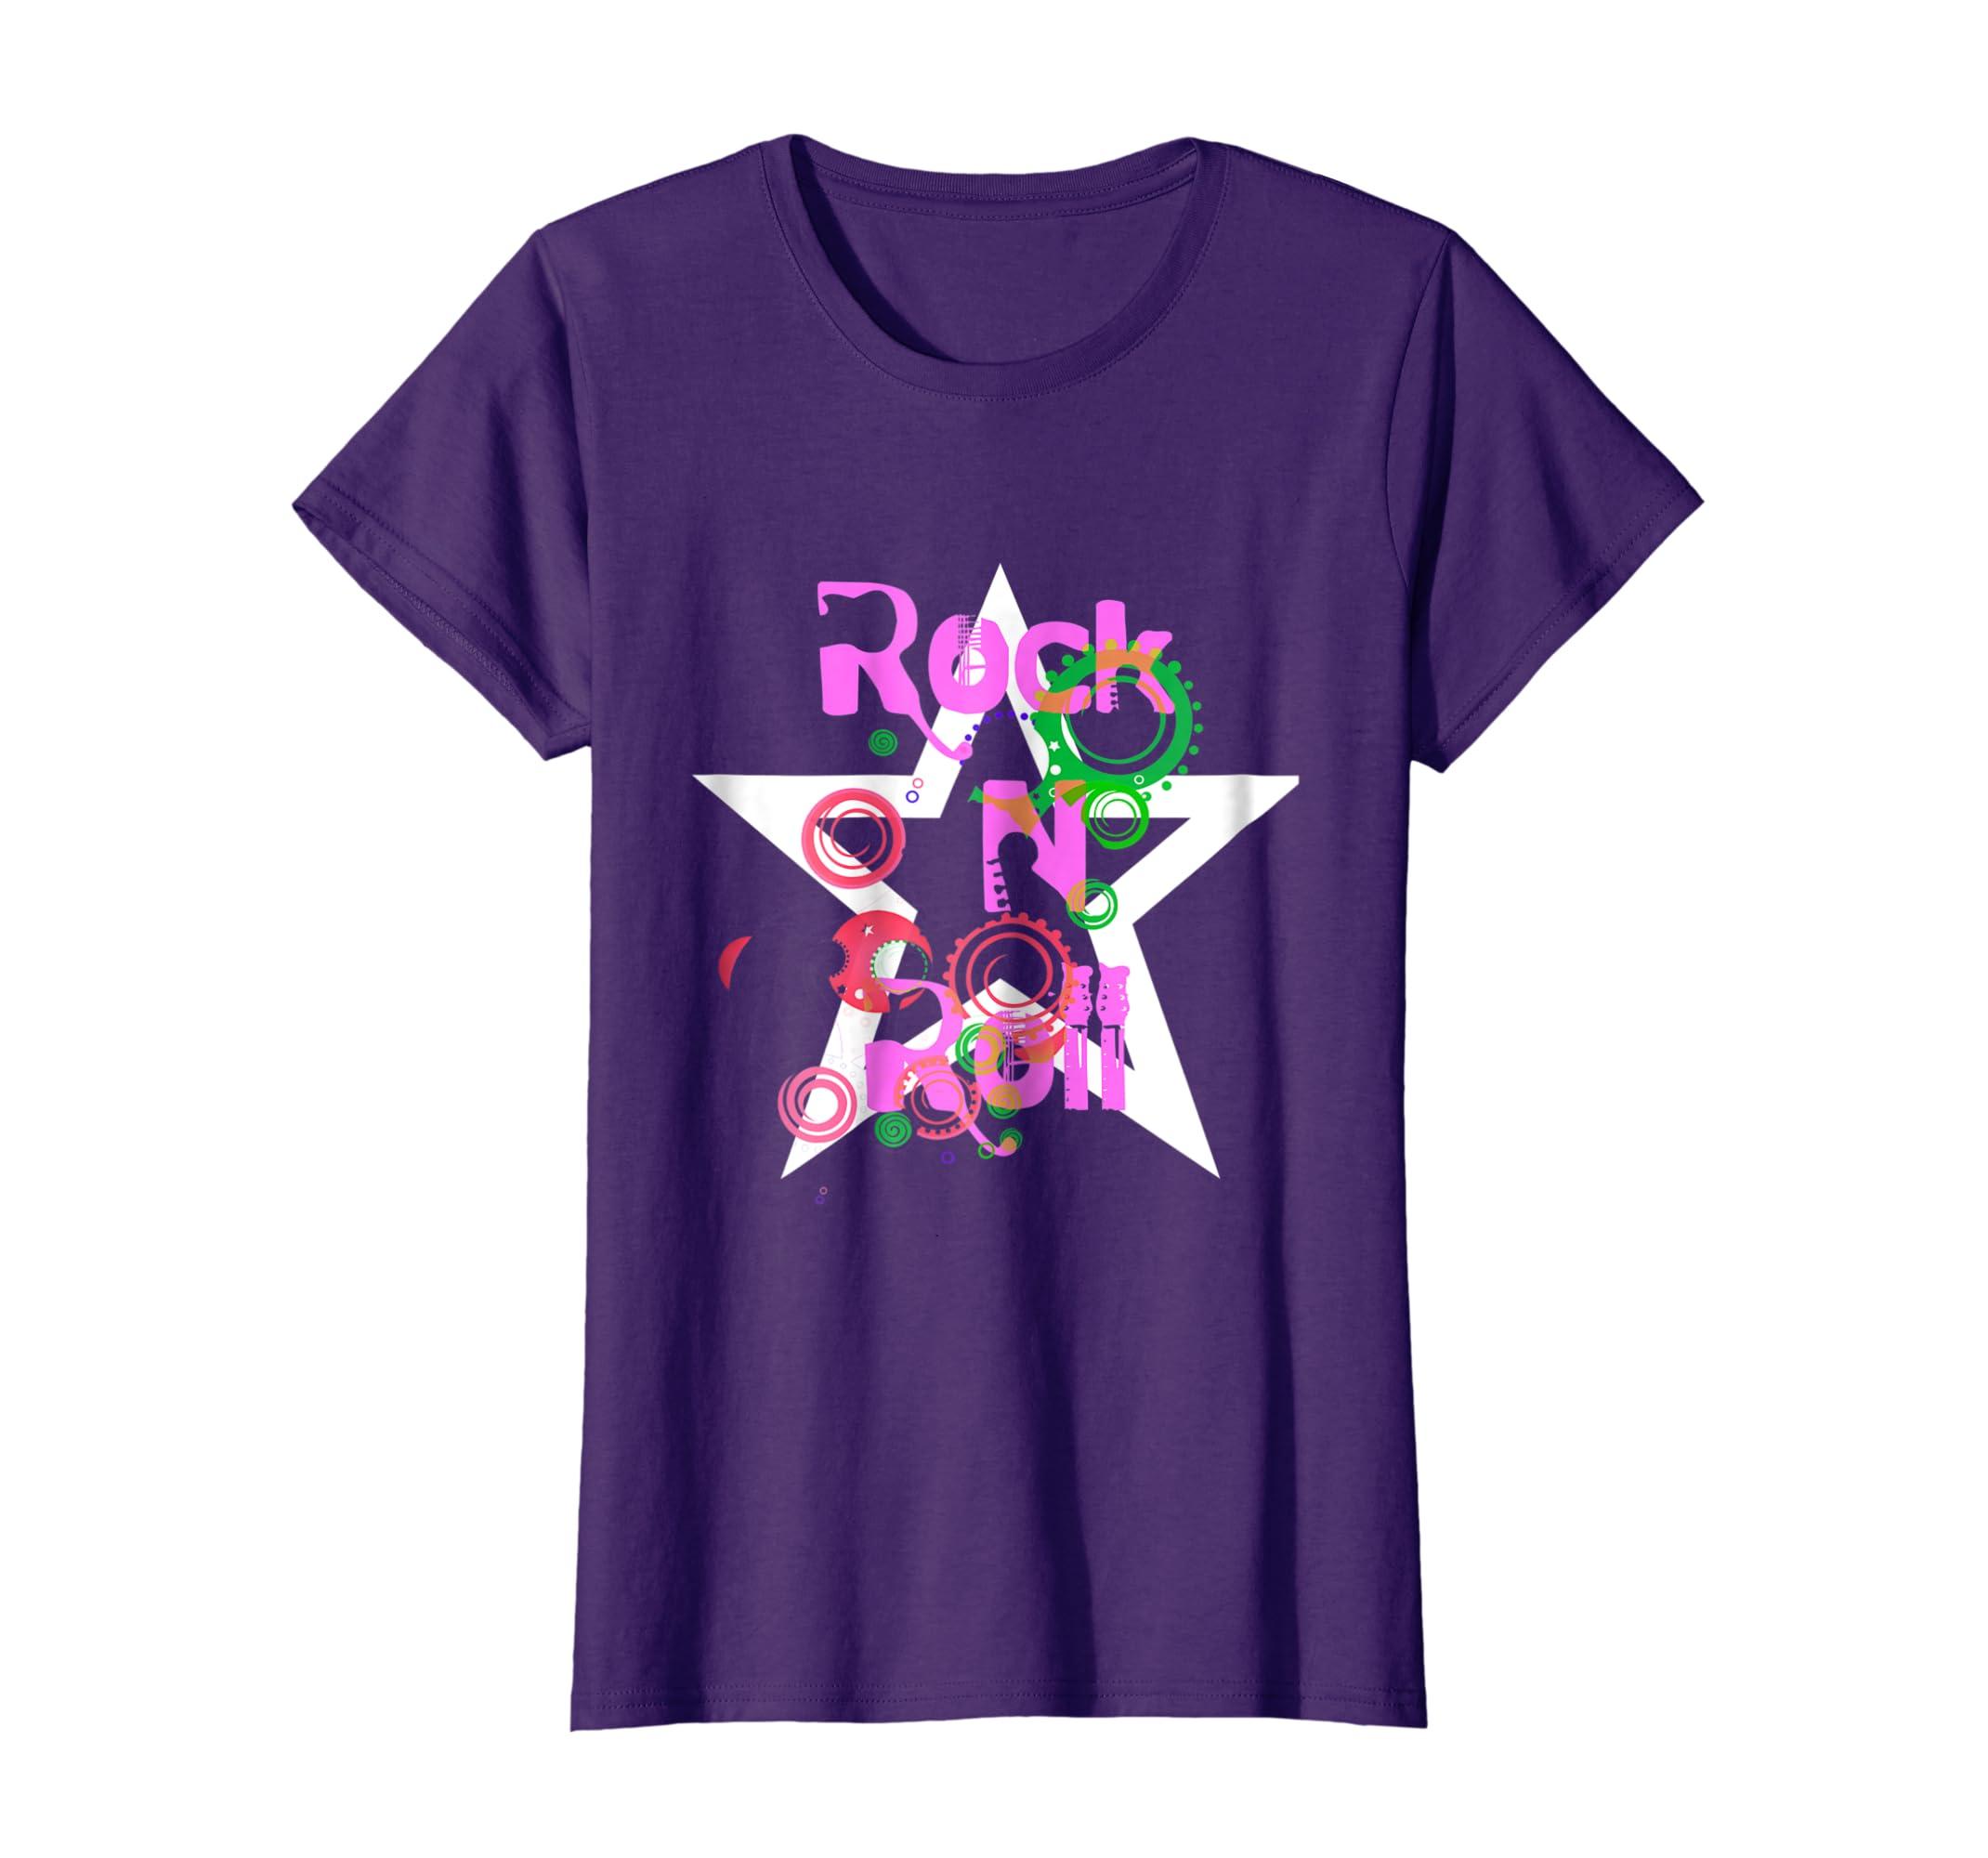 59c7fe9e872 Amazon.com  Vintage Nostalgic Rock Art Music Rock N Roll T-Shirt  Clothing